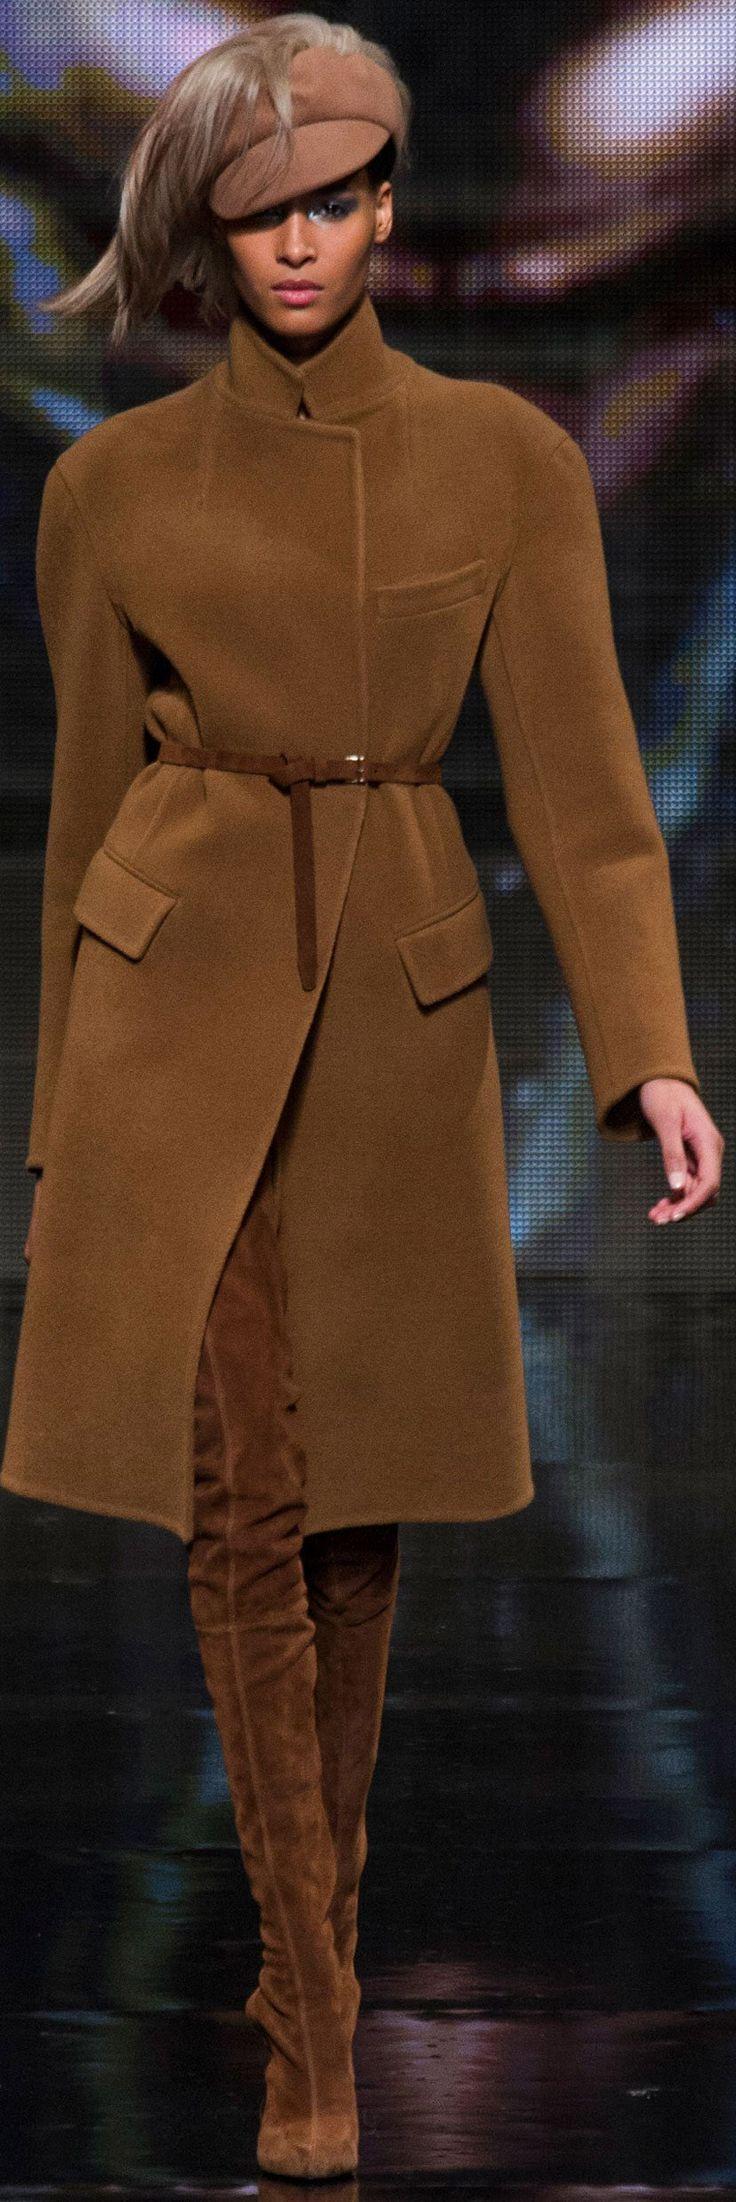 Donna Karan Autumn Fall / Winter 2014